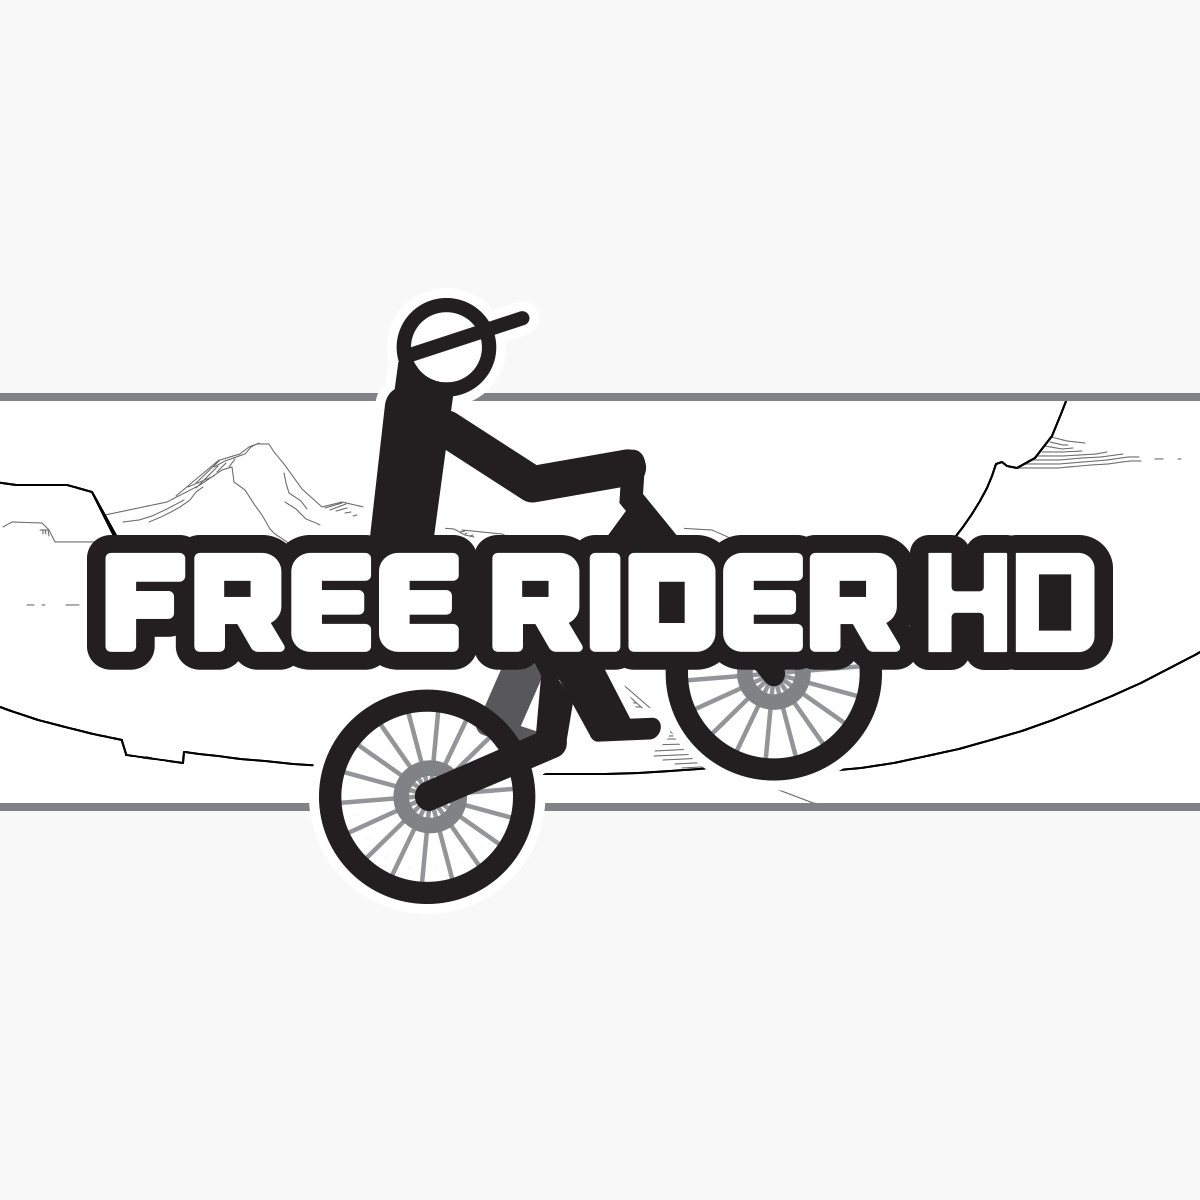 free rider tracks